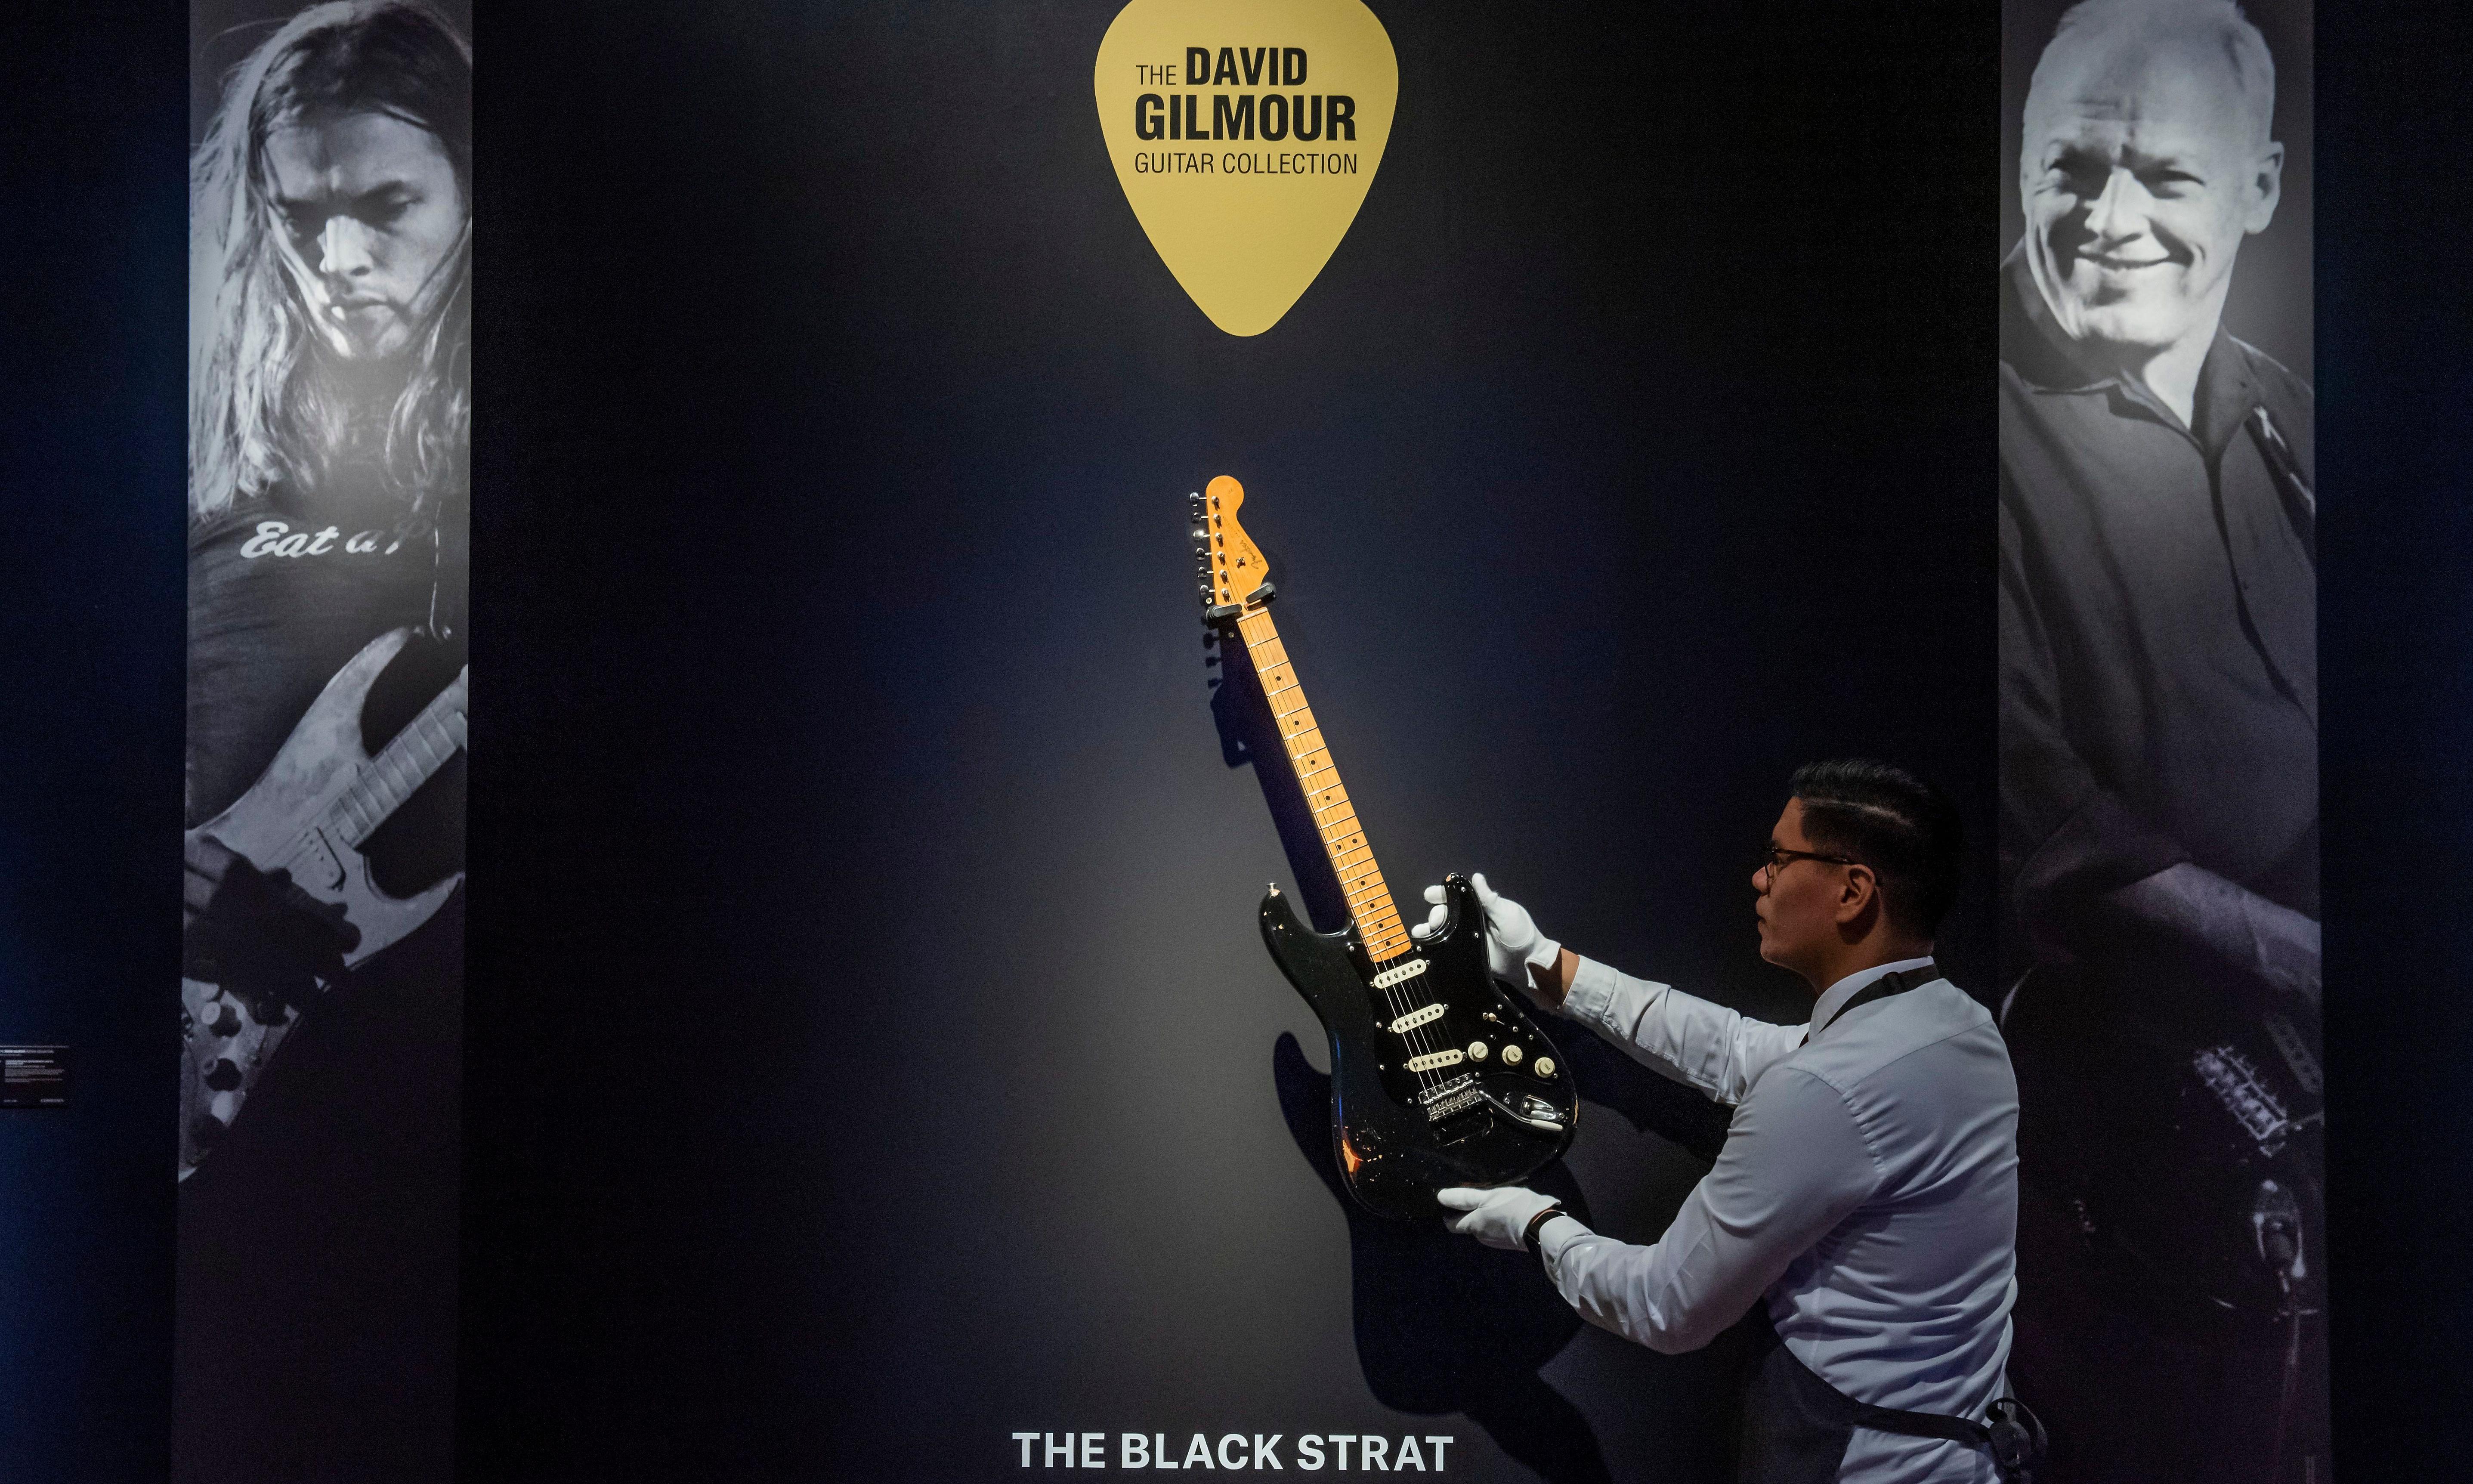 Comfortably strum: David Gilmour's Black Strat goes on display